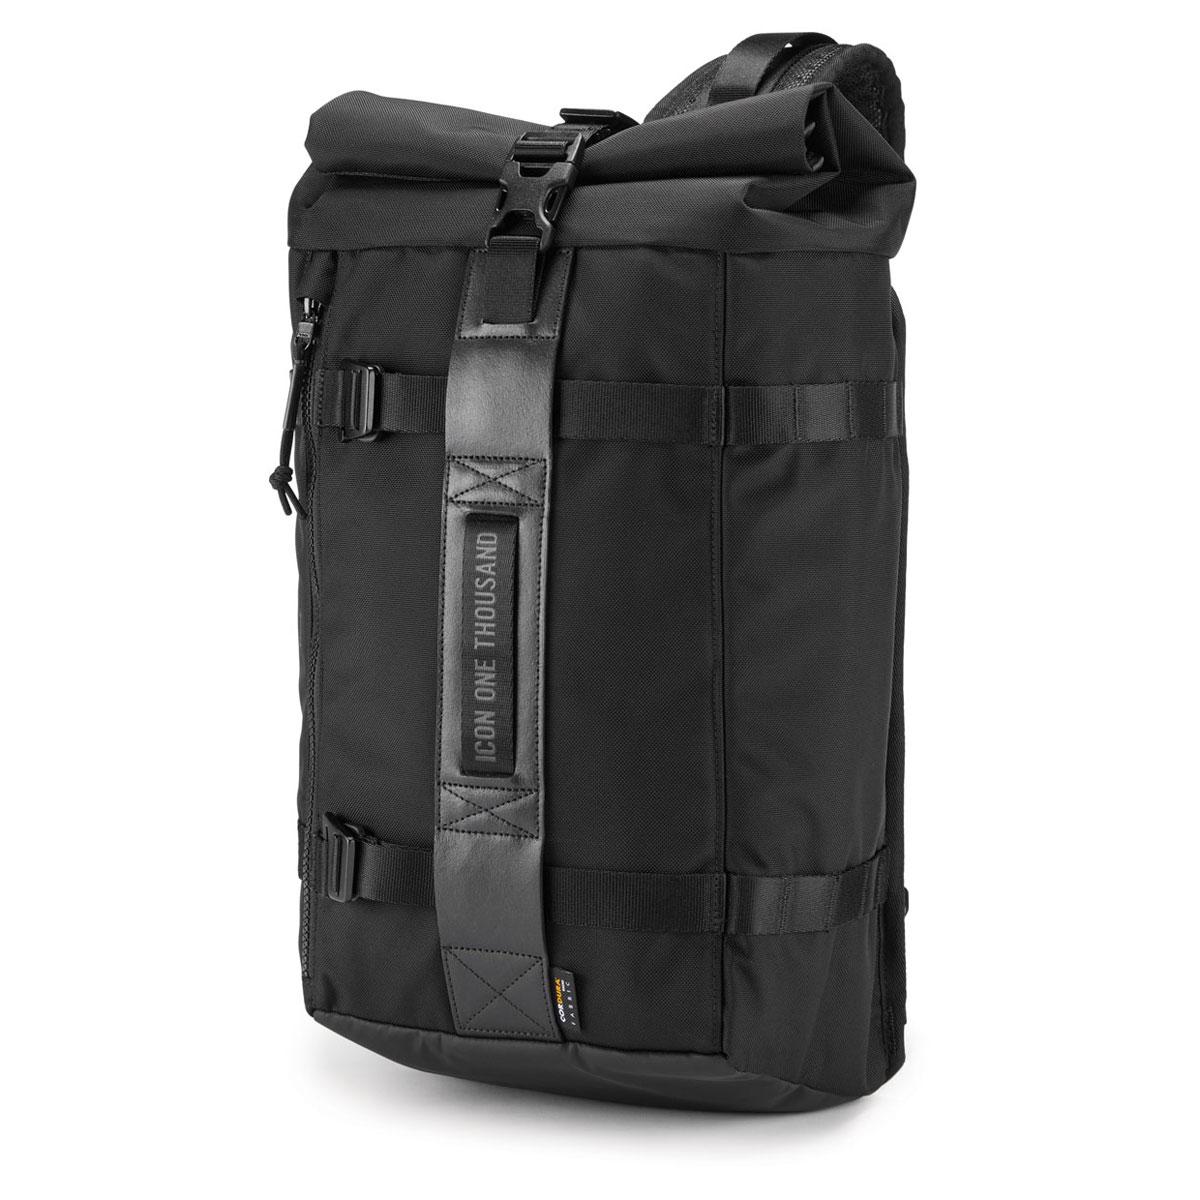 ICON One Thousand Slingbag Backpack